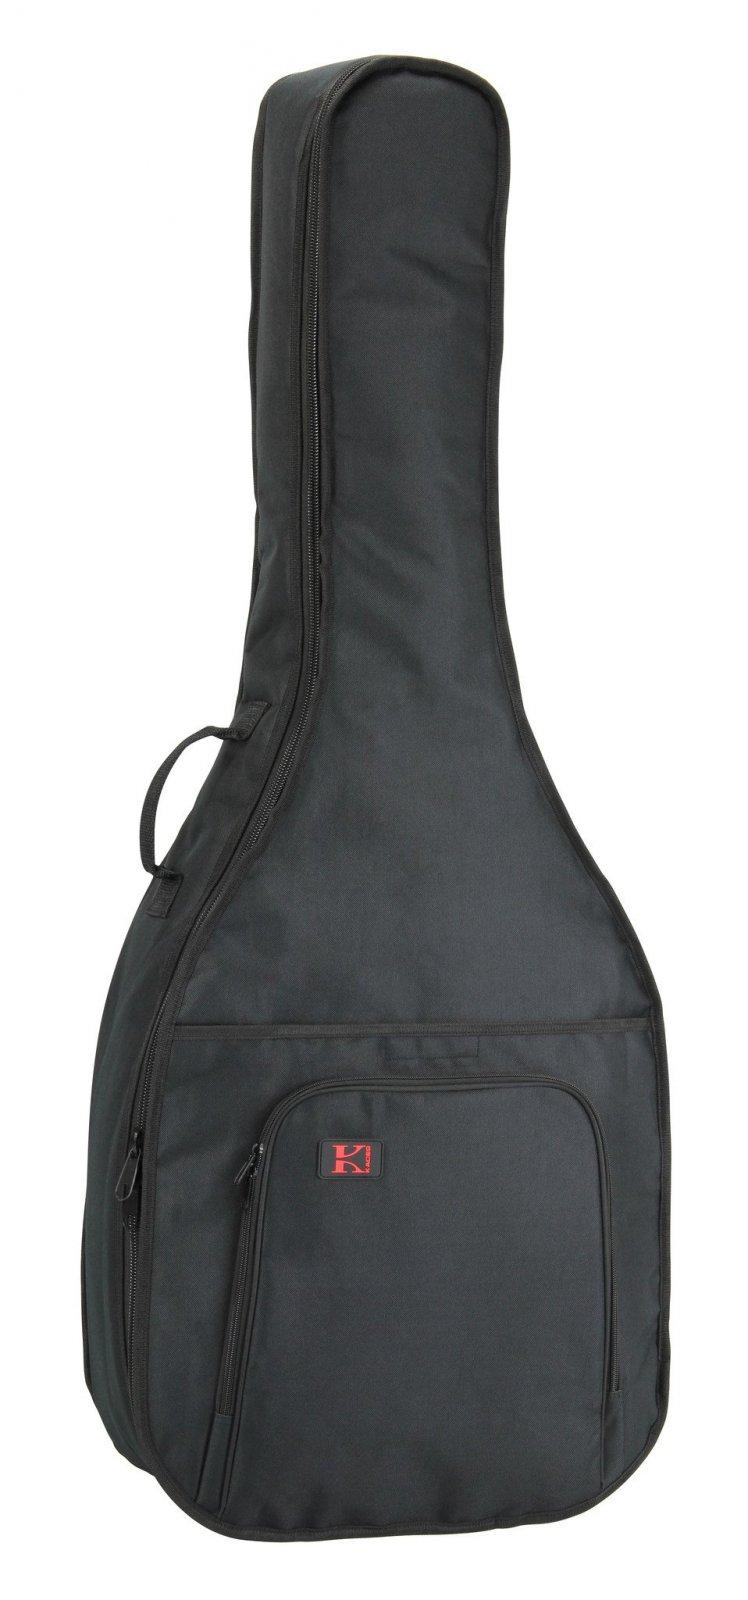 Kaces GigPak Acoustic Guitar Bag (KQA-120)